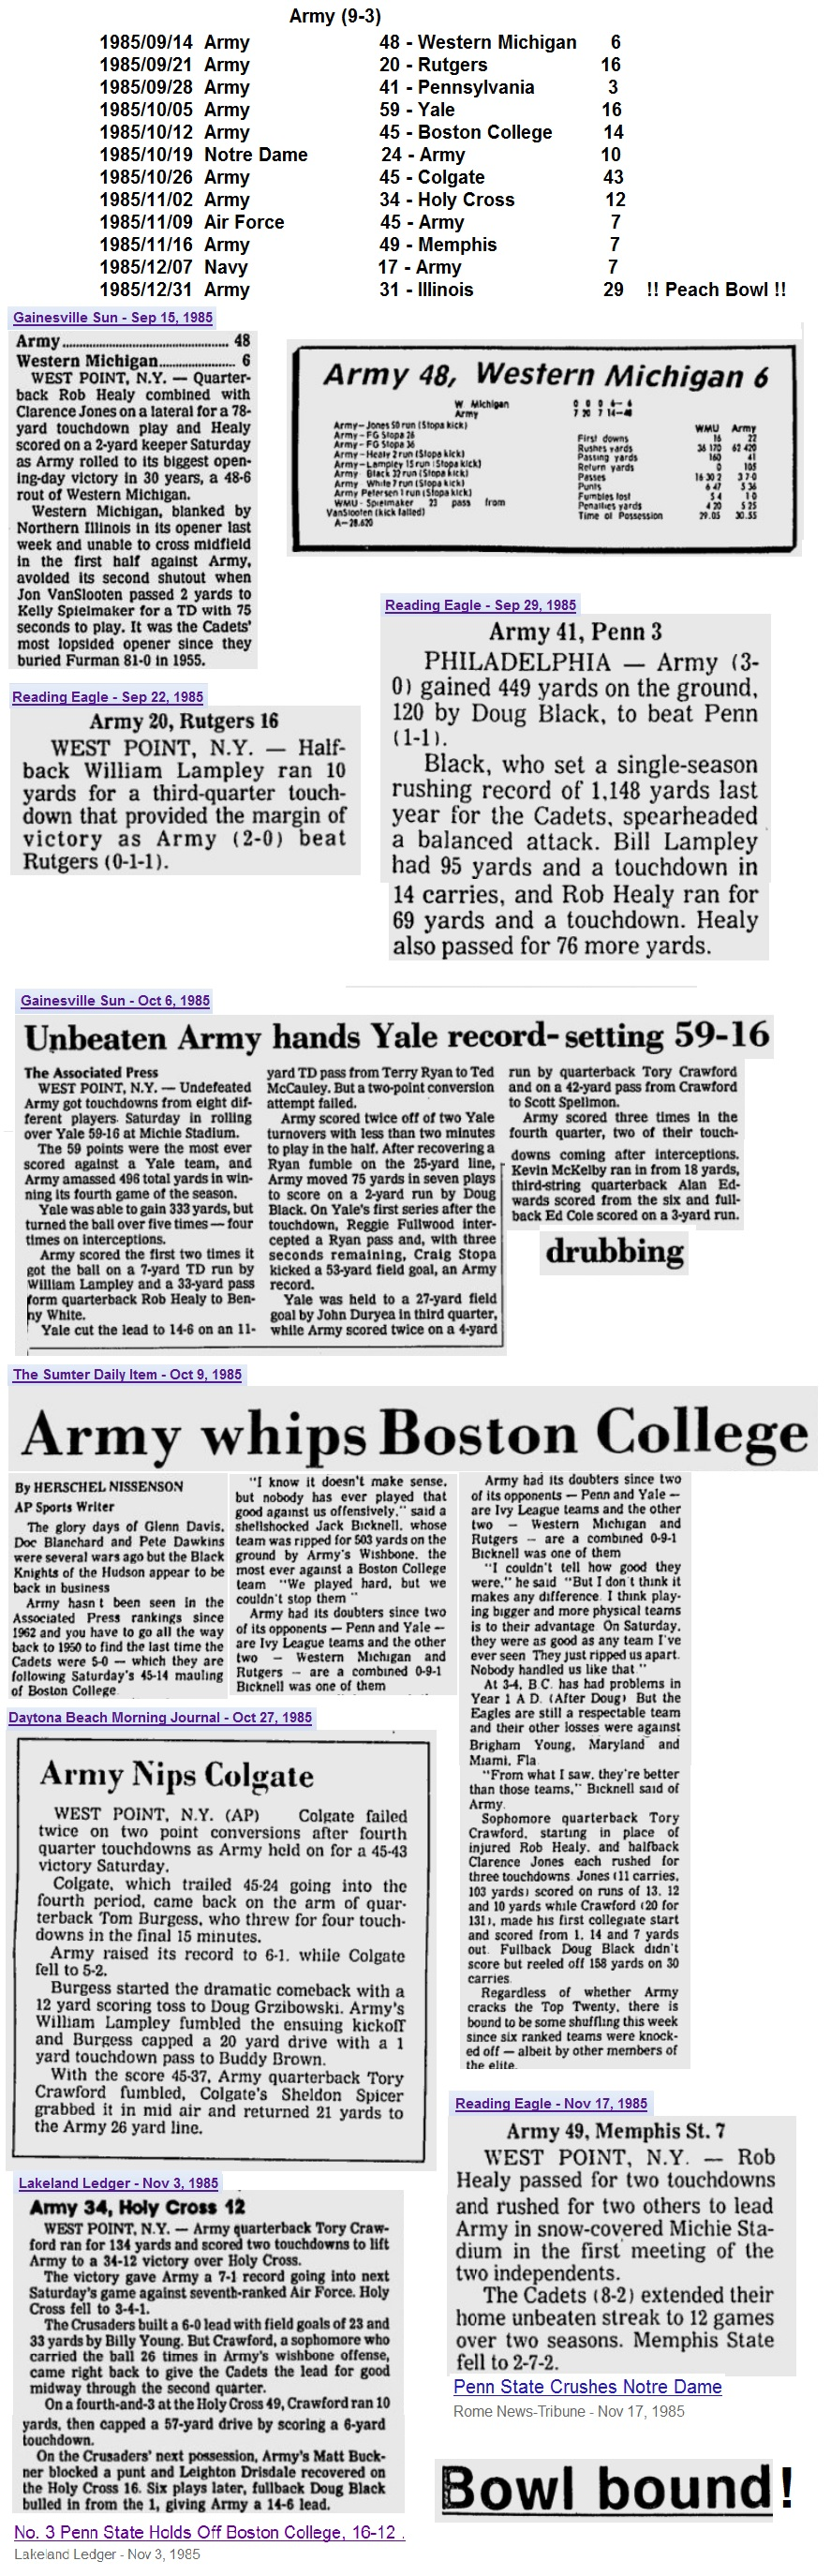 ArmyFB_1985_victories_various _Sep-Nov1985